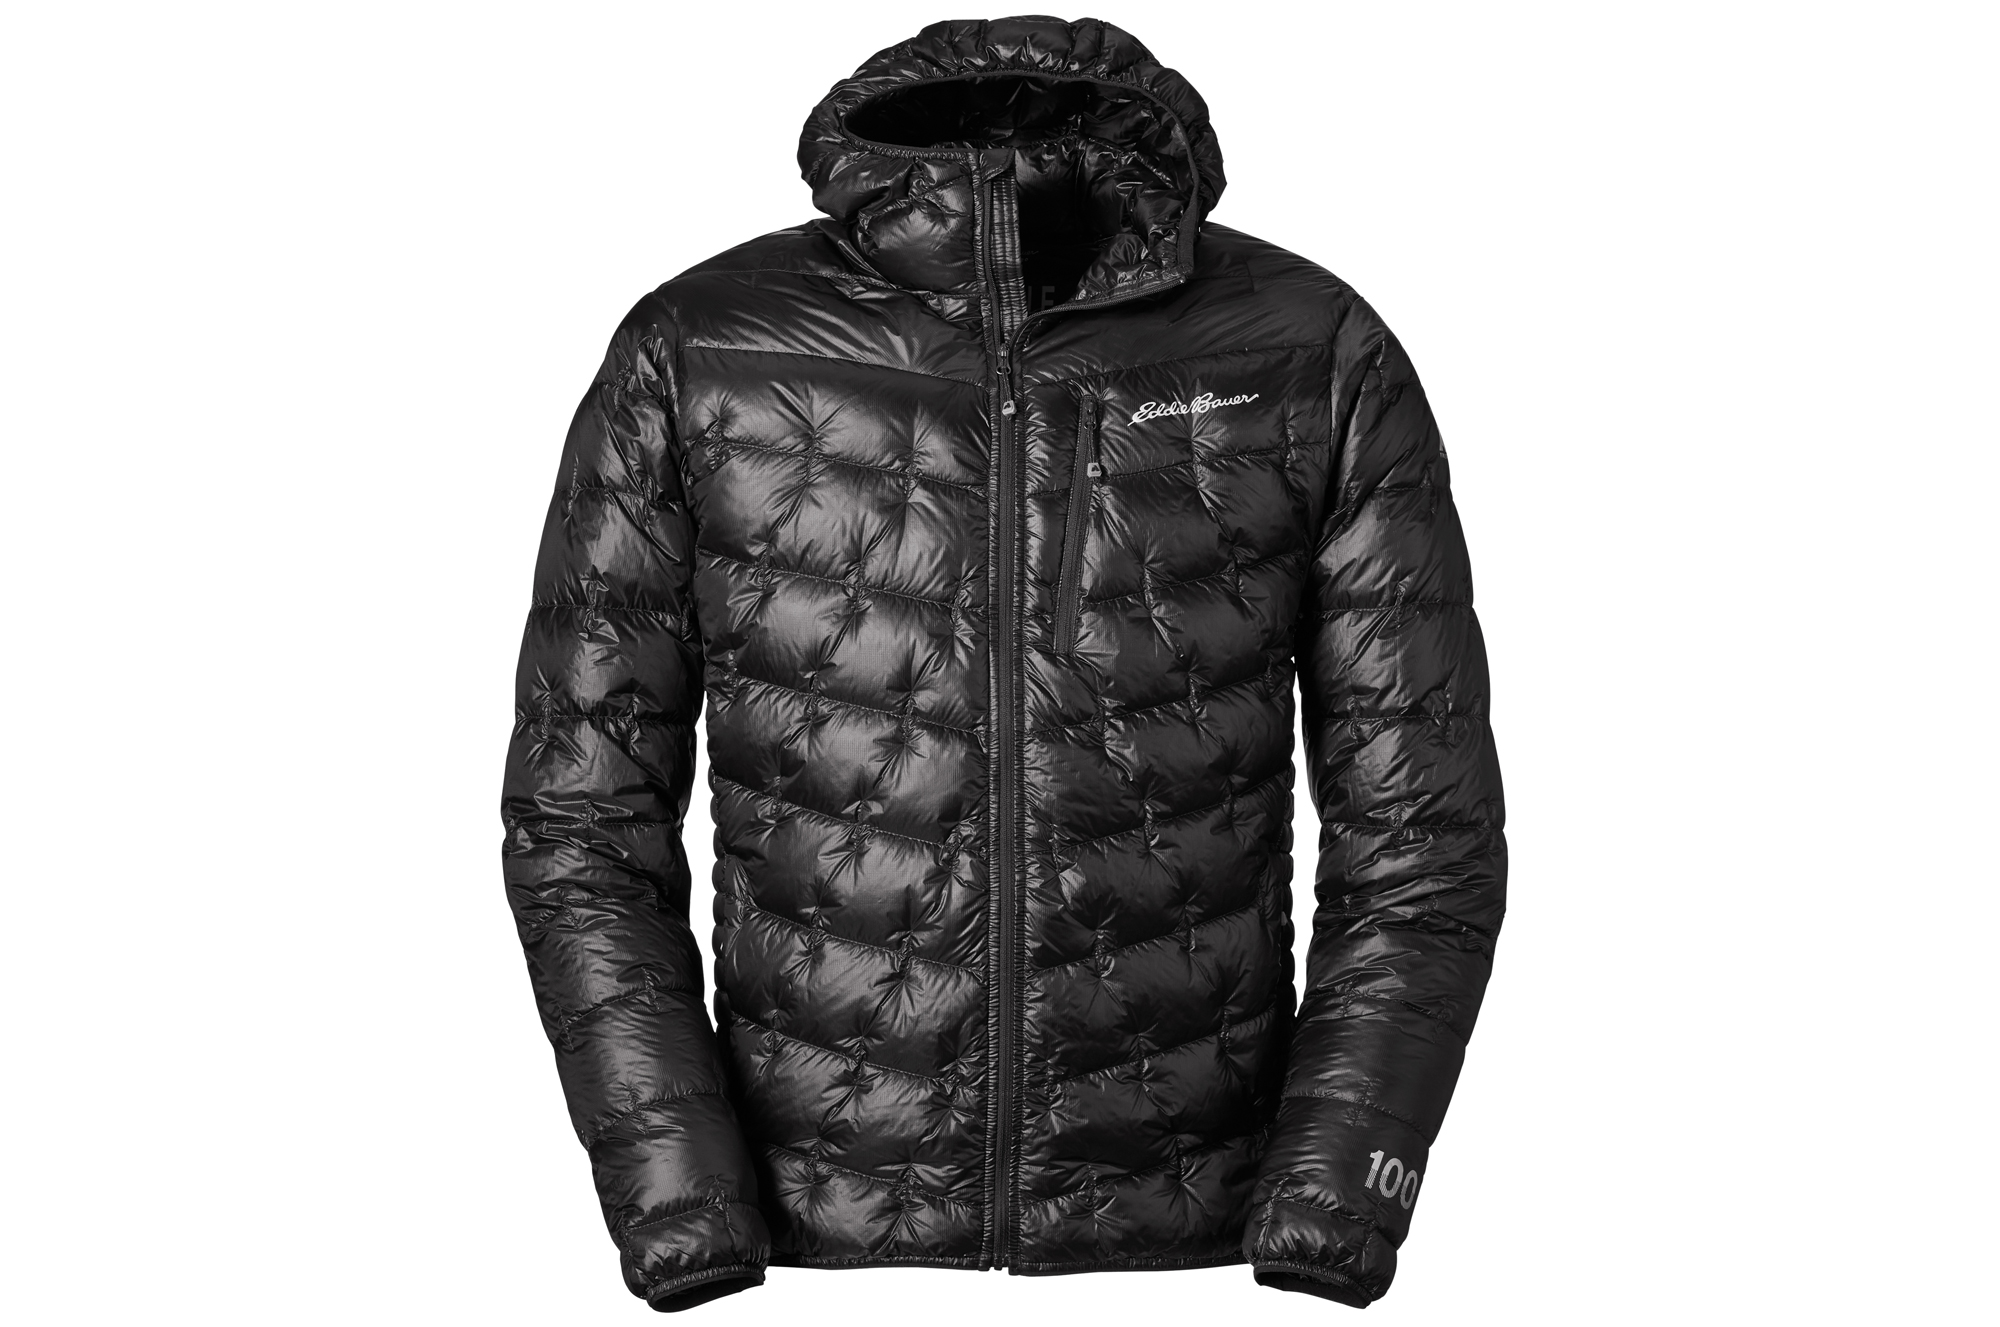 Eddie Bauer MicroTherm 1000 down jacket